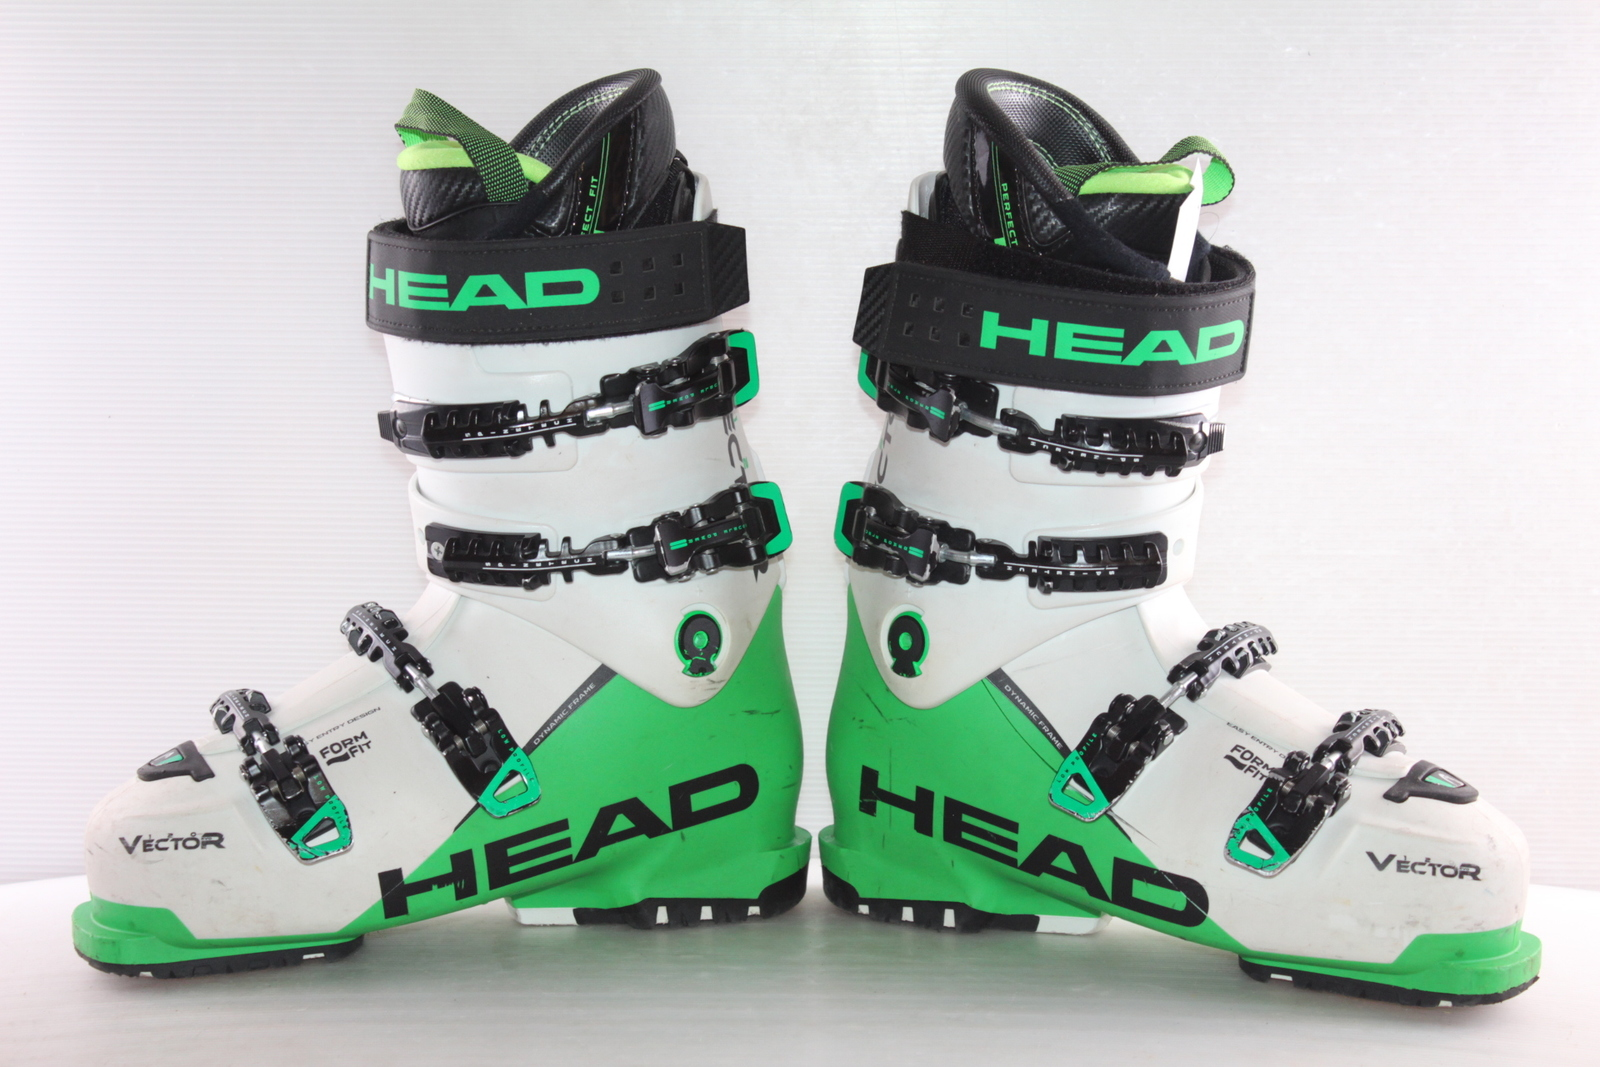 Lyžařské boty Head Vector Evo 120 vel. EU42.5 flexe 120